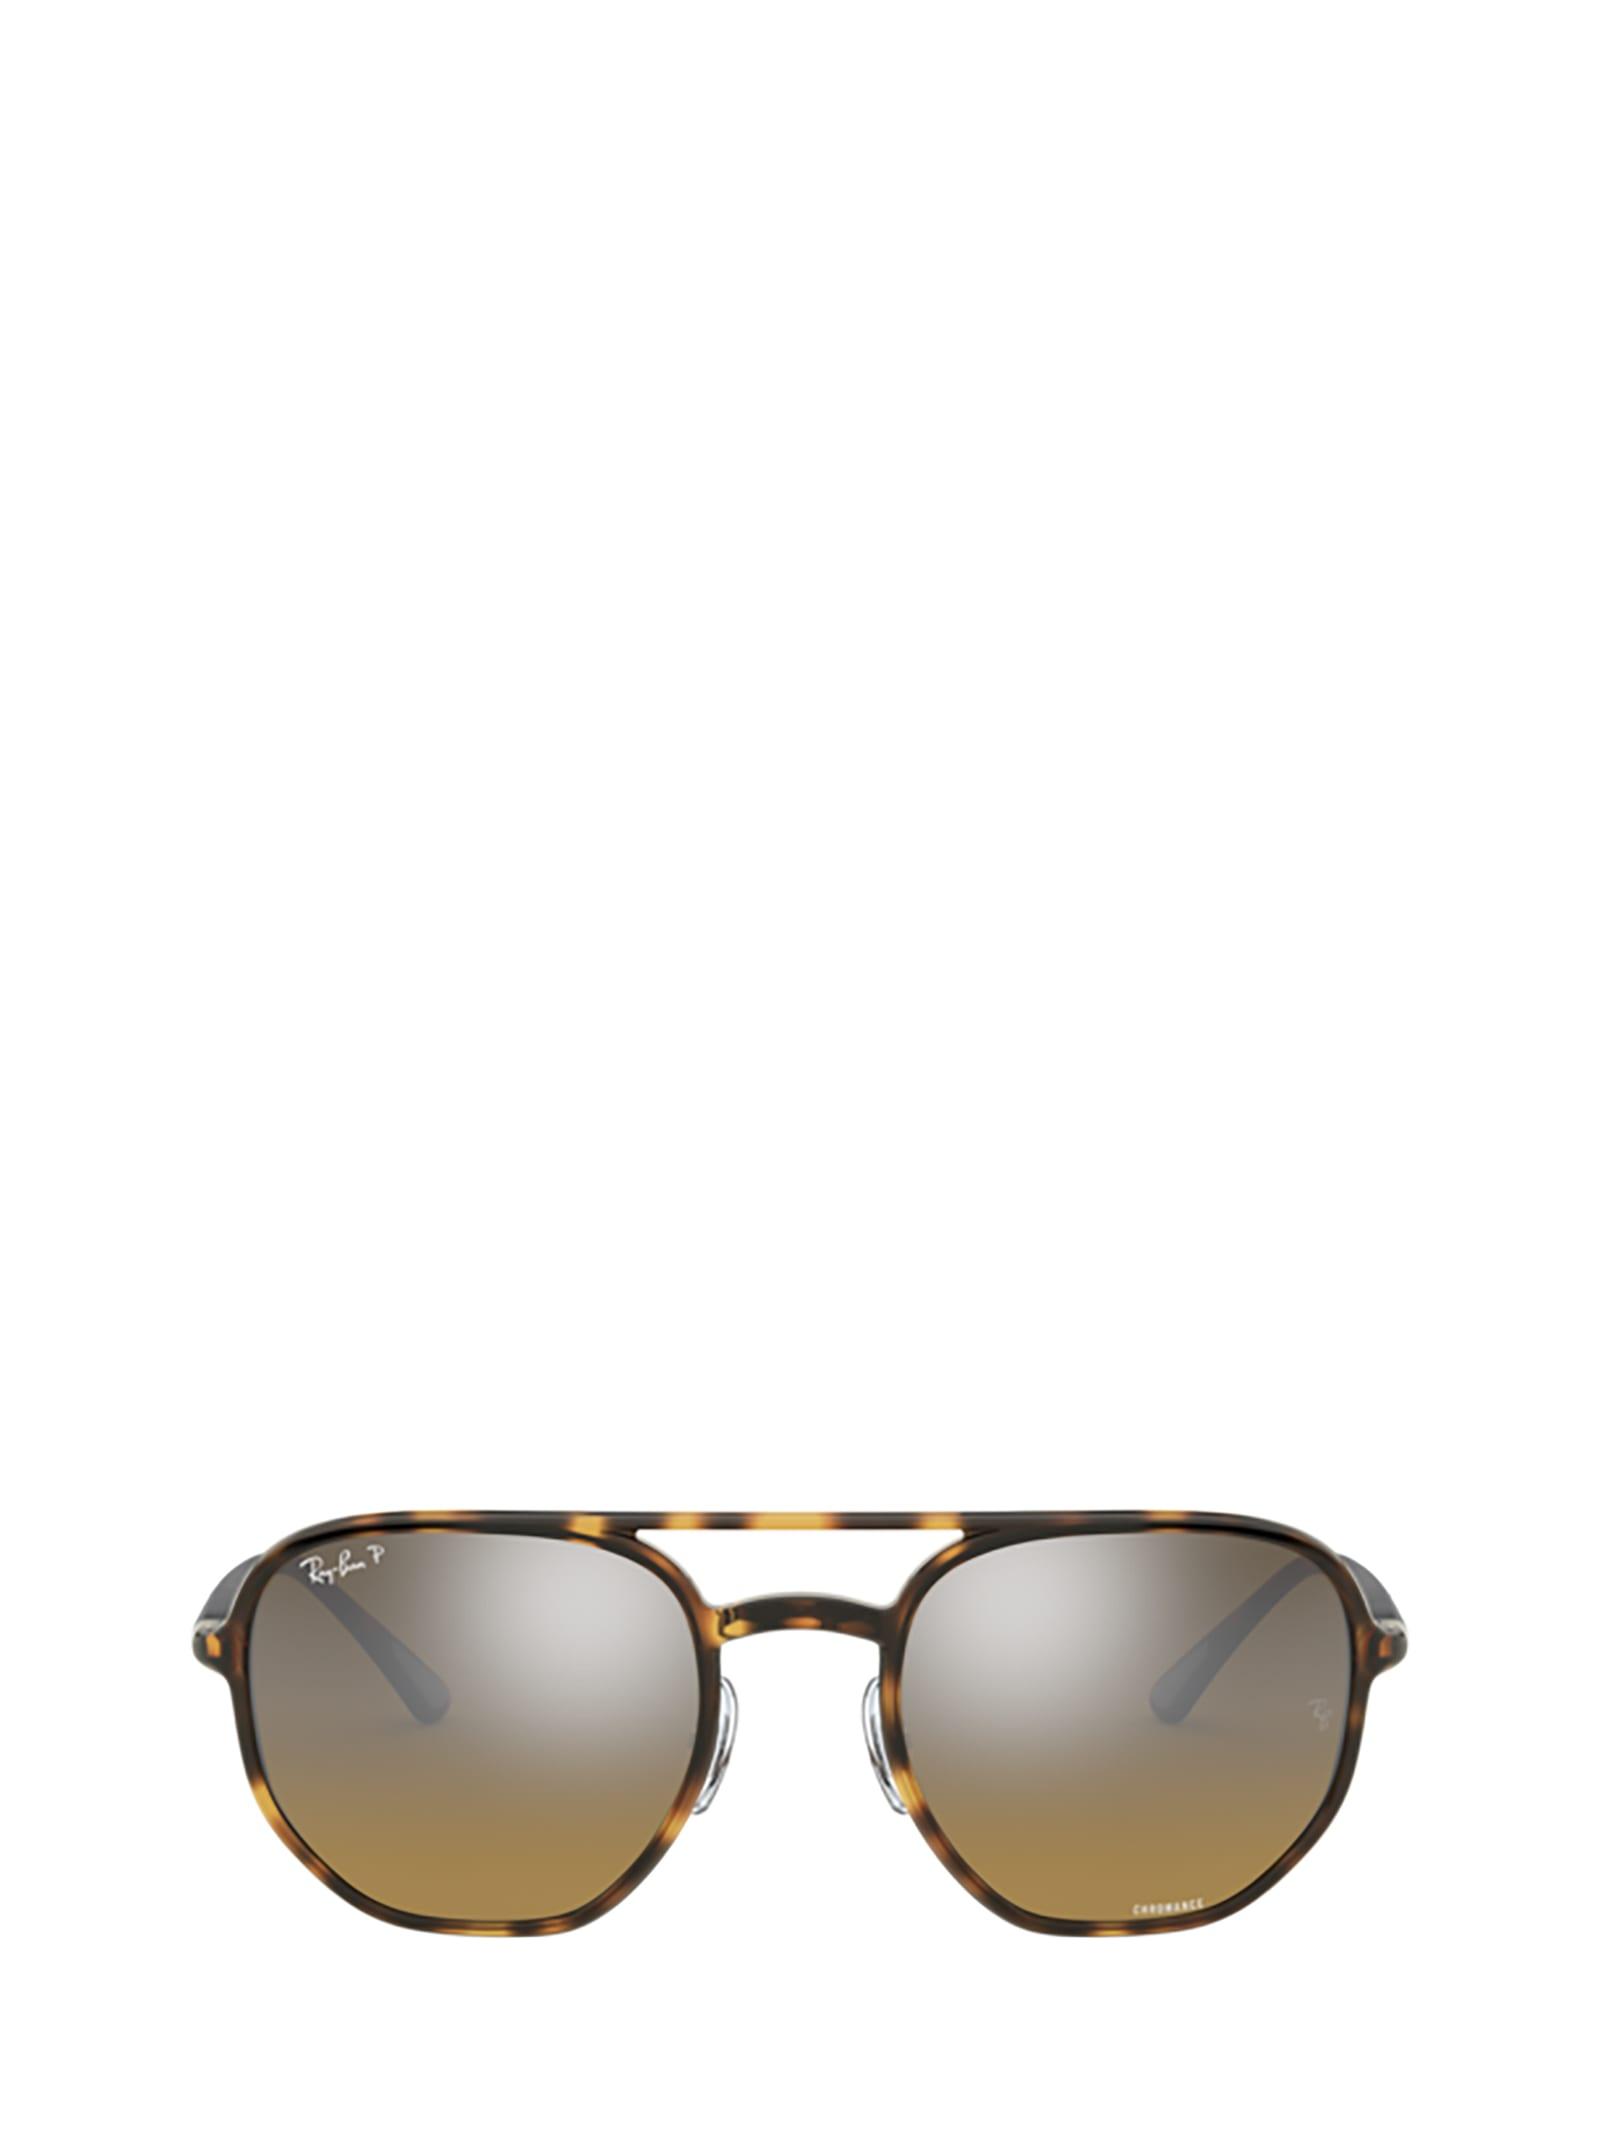 Ray-Ban Ray-ban Rb4321ch Light Havana Sunglasses